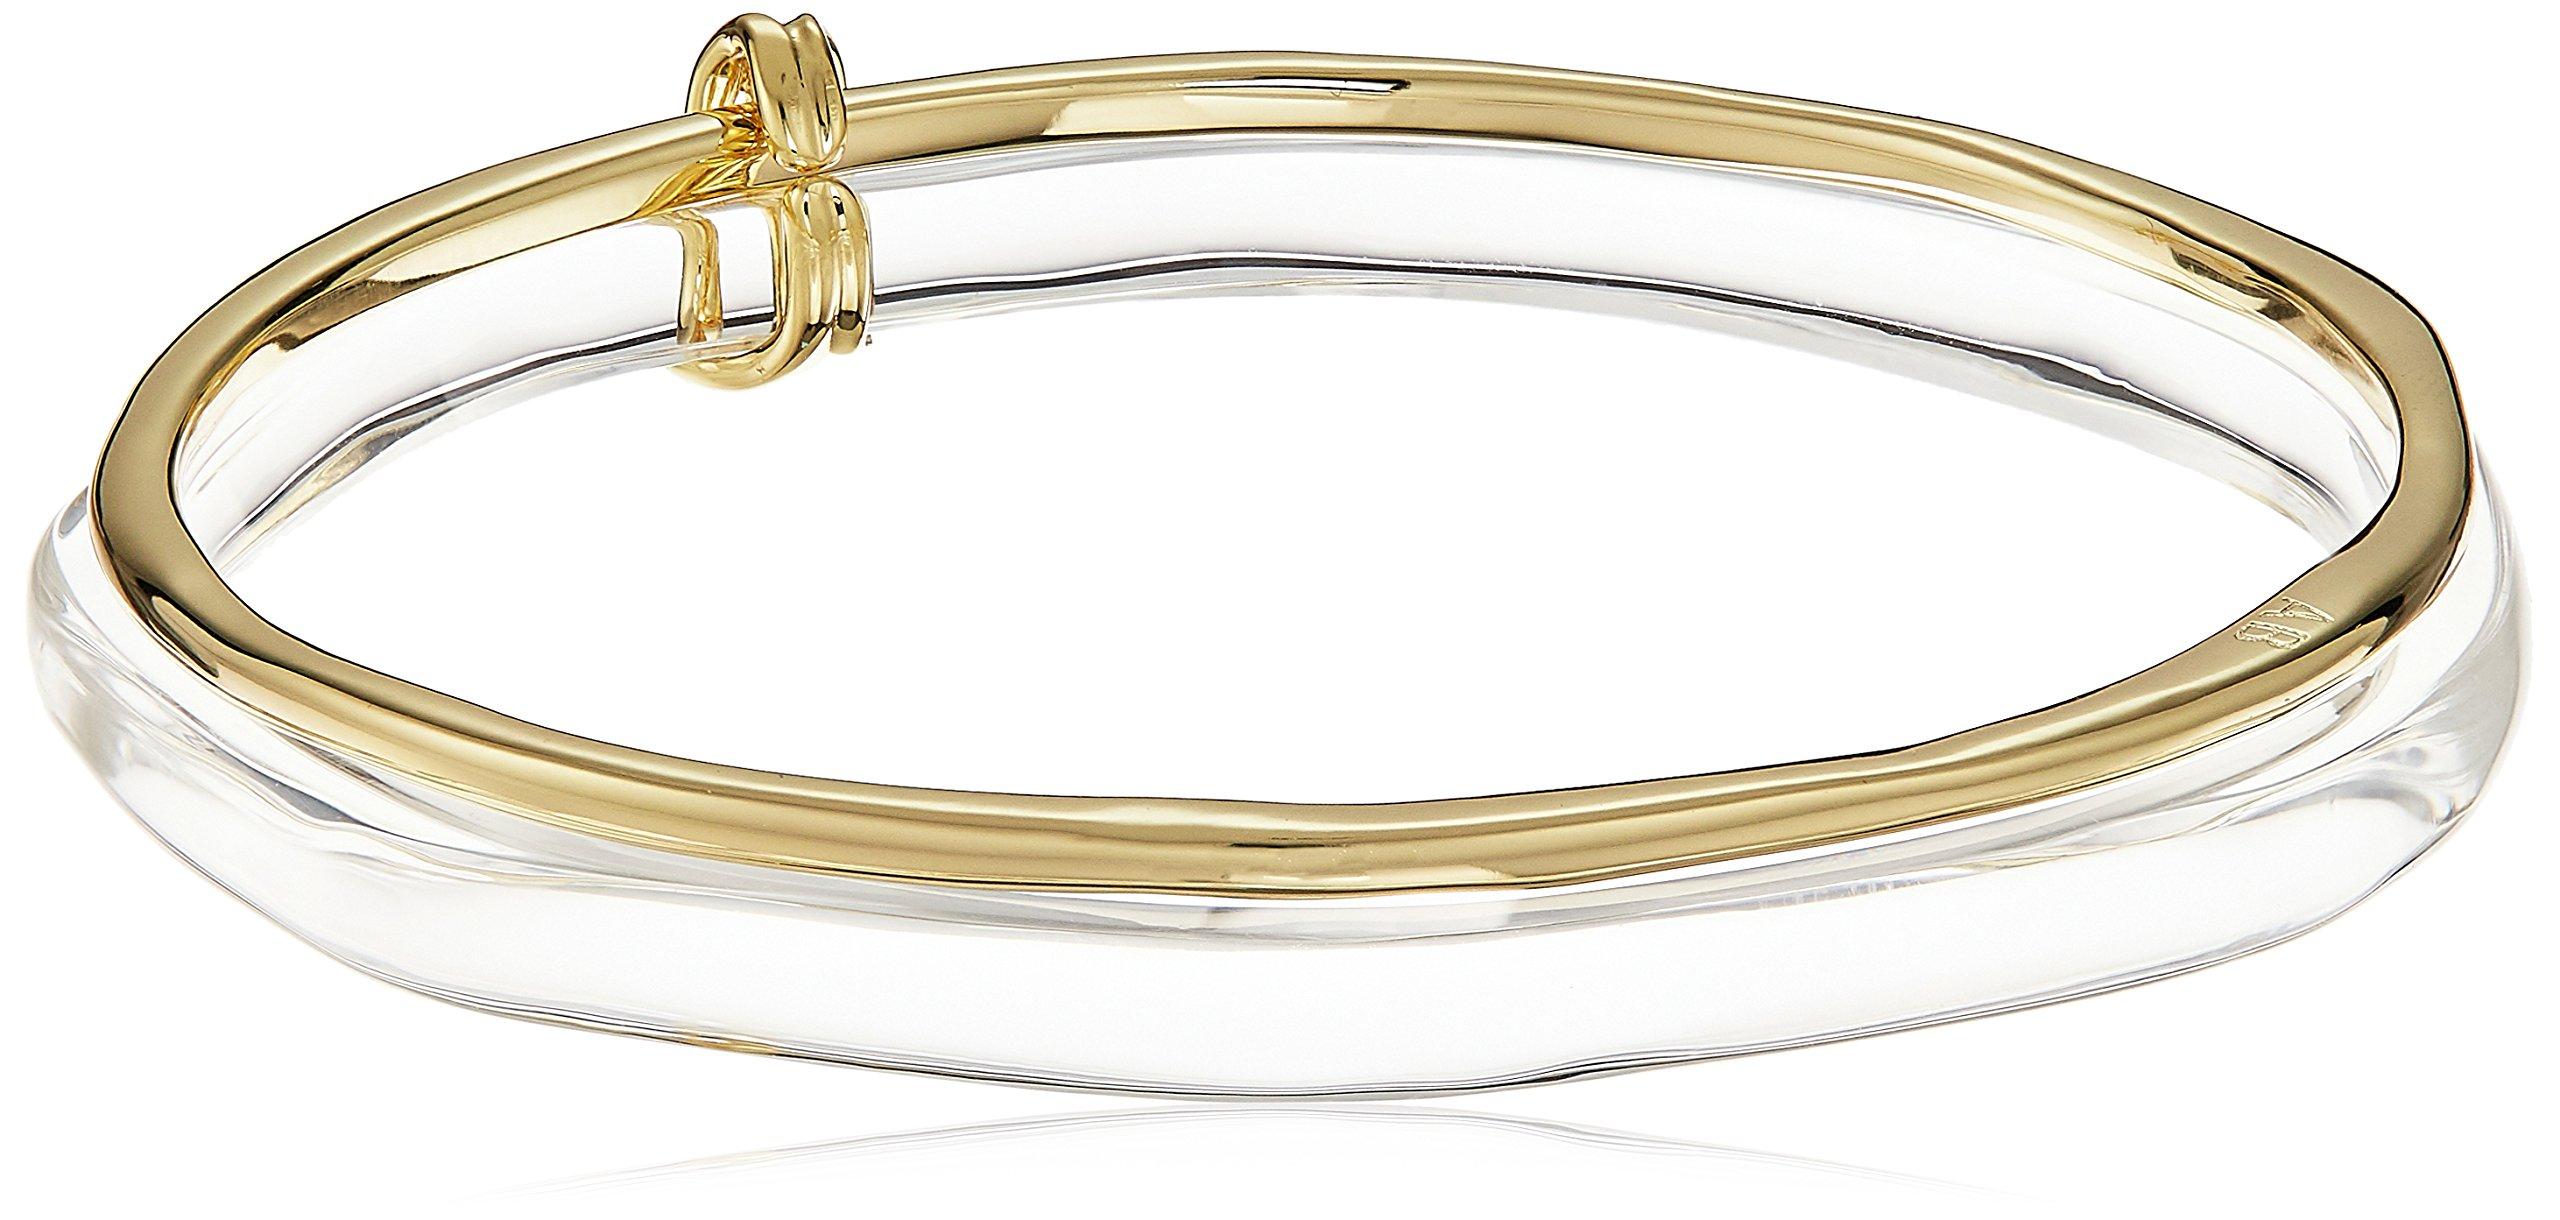 Alexis Bittar Liquid Metal Paired Bangle Bracelet